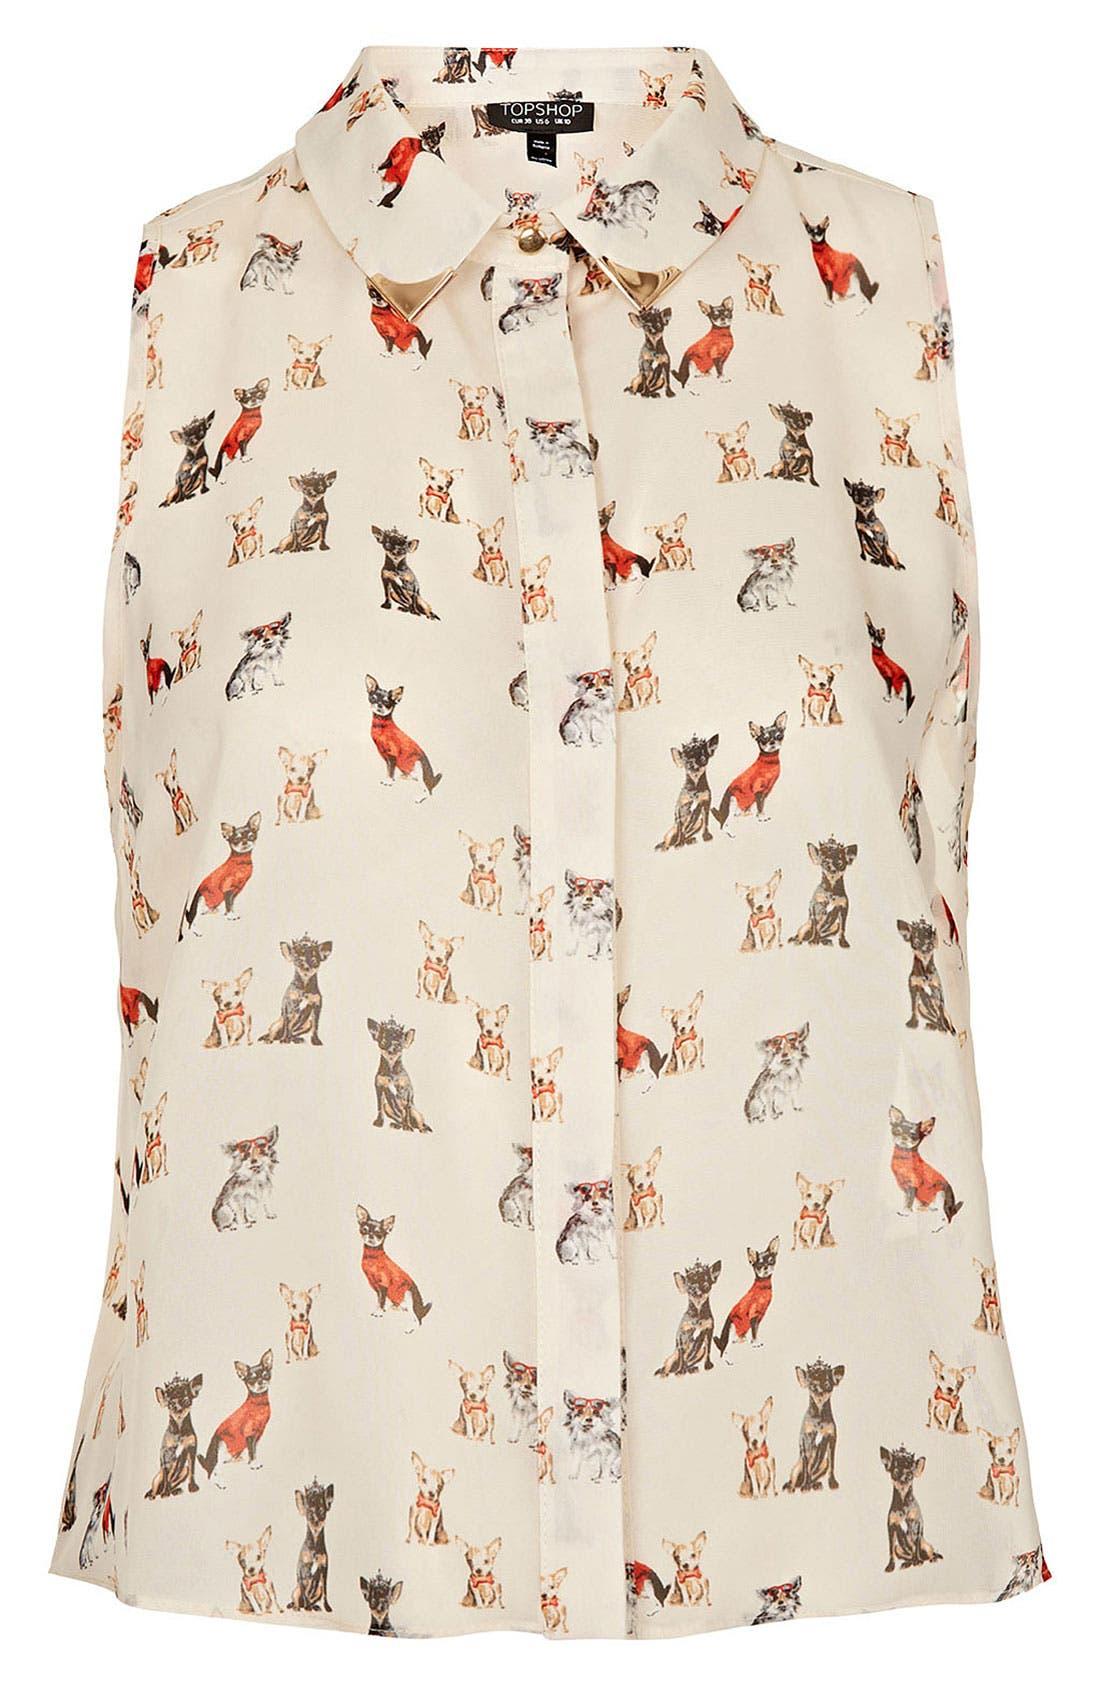 Alternate Image 1 Selected - Topshop Dog Print Sleeveless Crop Shirt